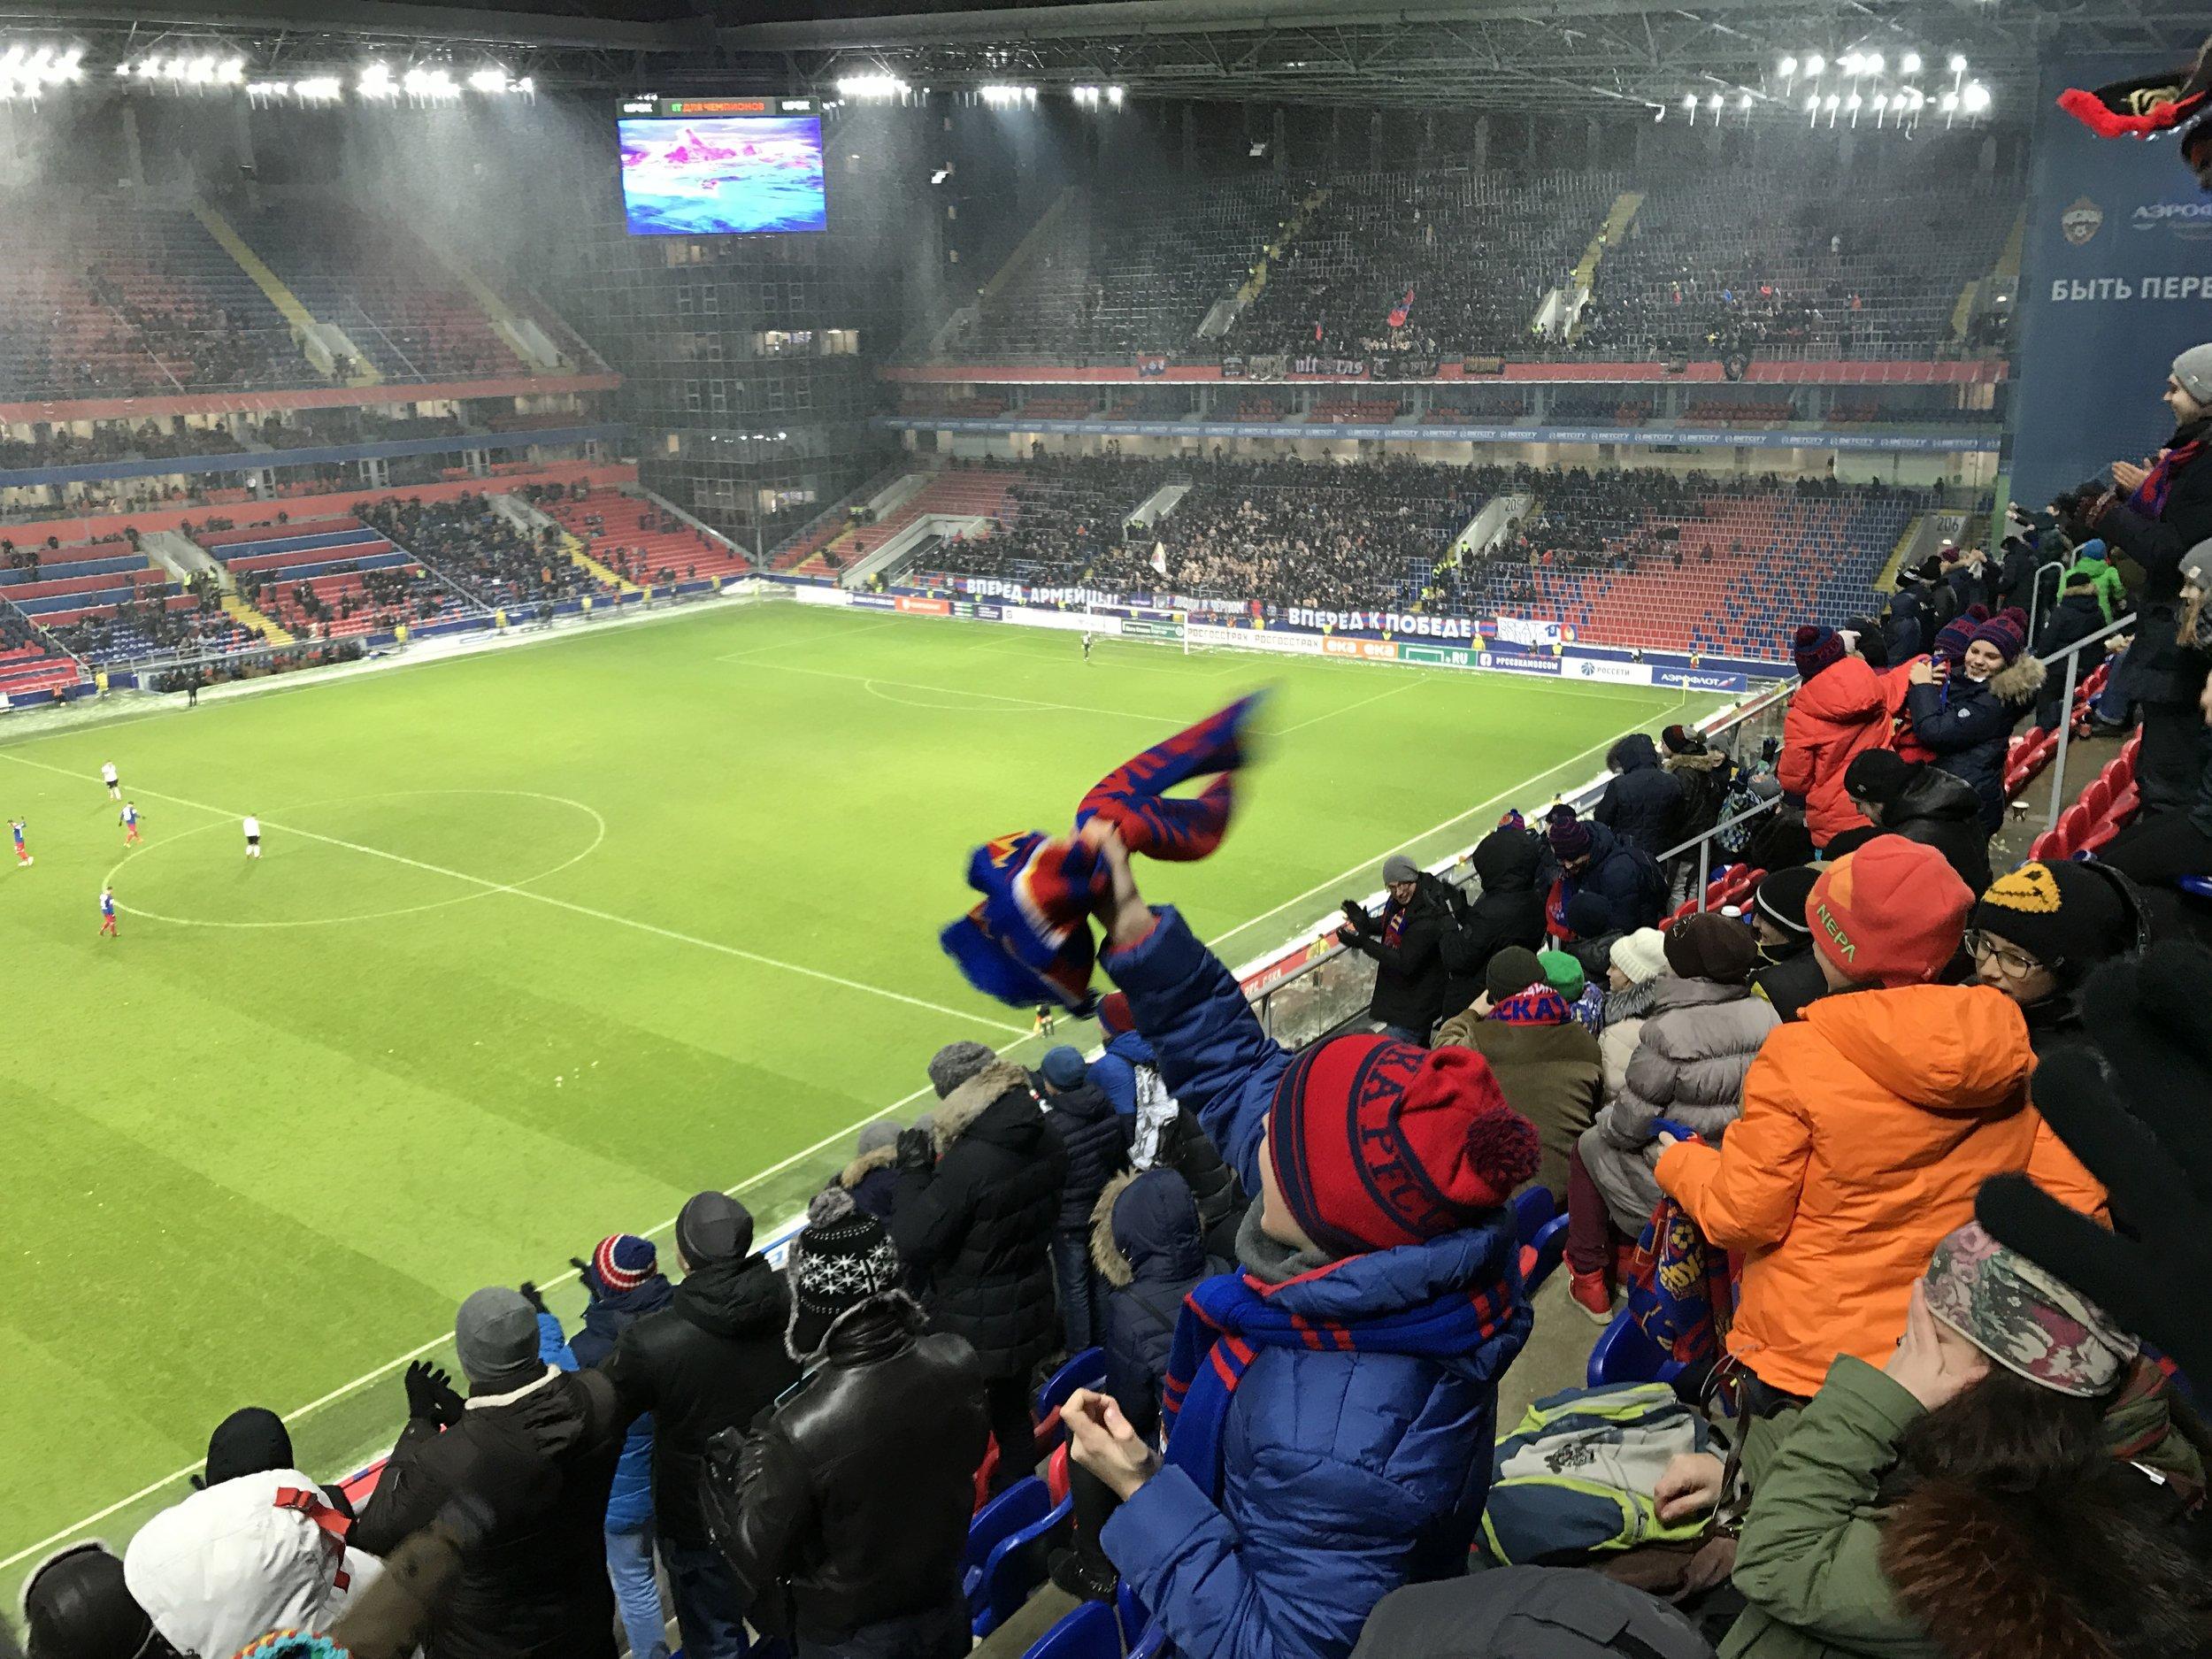 CSKA-Moscow-Supporters-Stadium